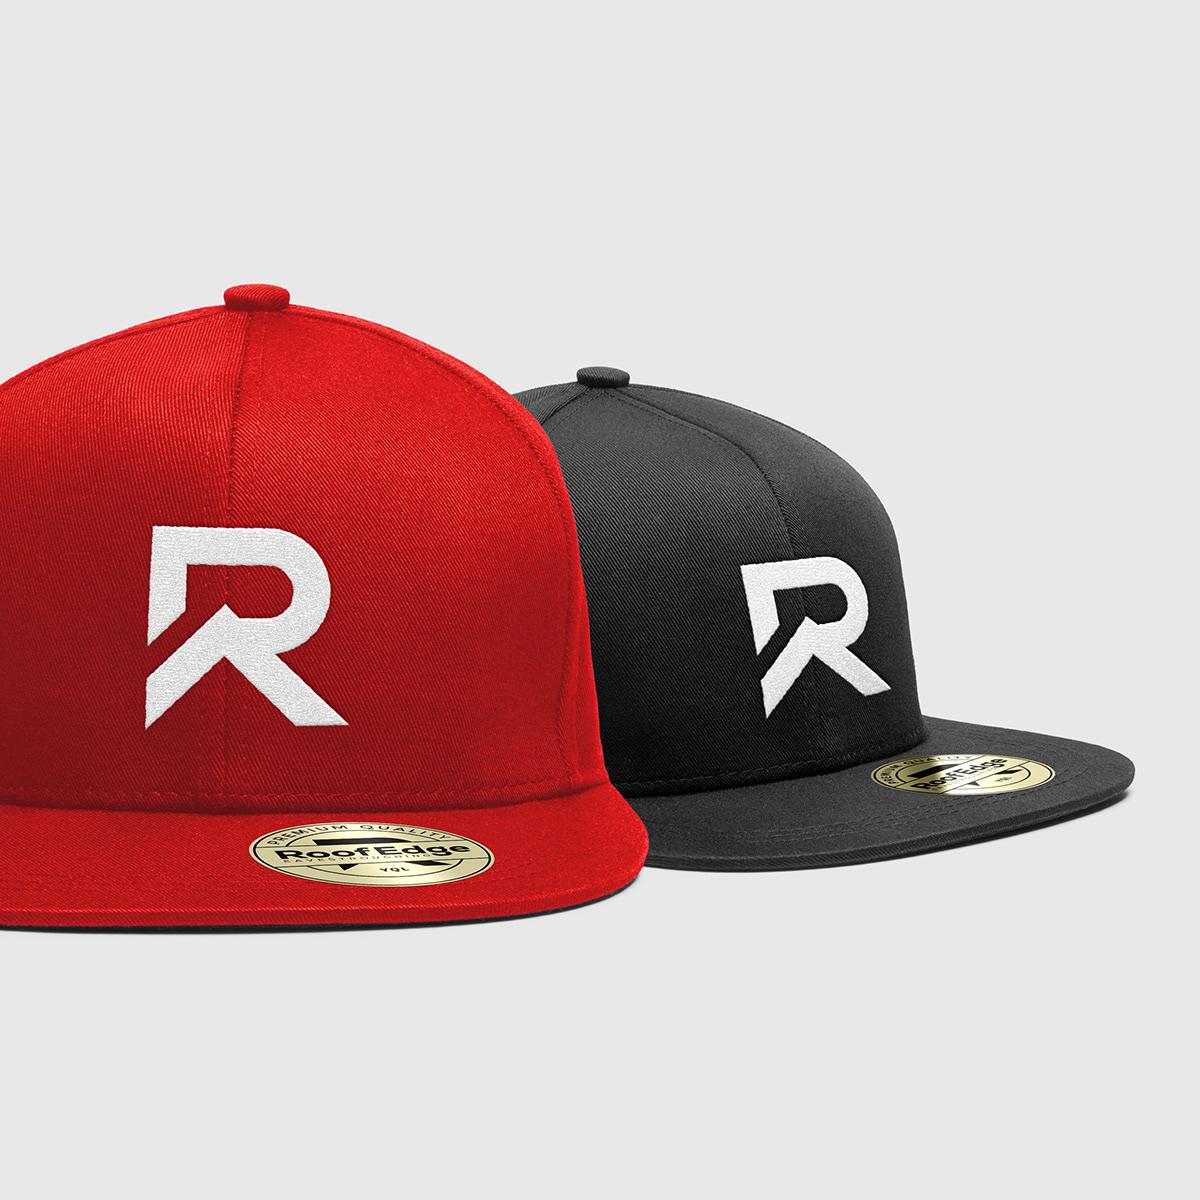 Image may contain: fashion accessory, cap and baseball cap